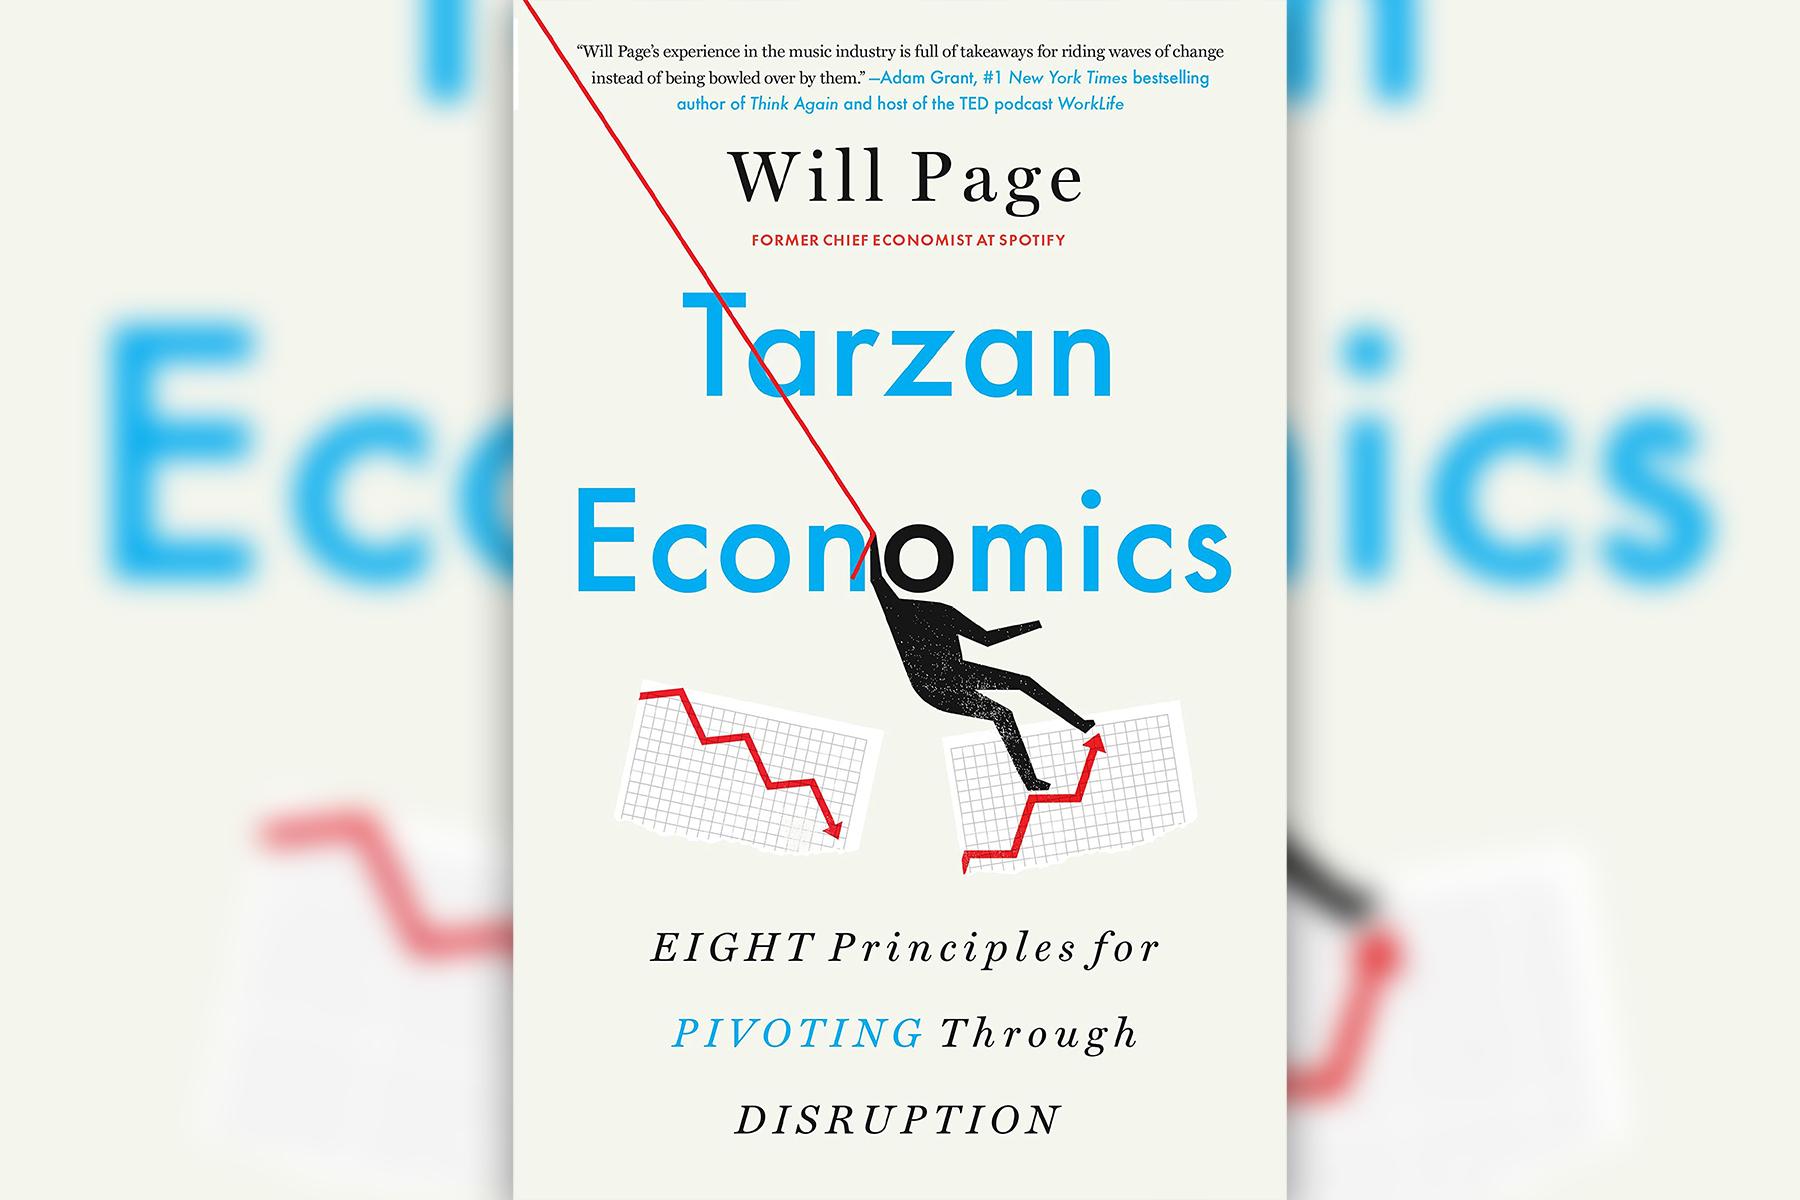 An Ex-Spotify Exec Breaks Down Modern Music's 'Tarzan Economics'